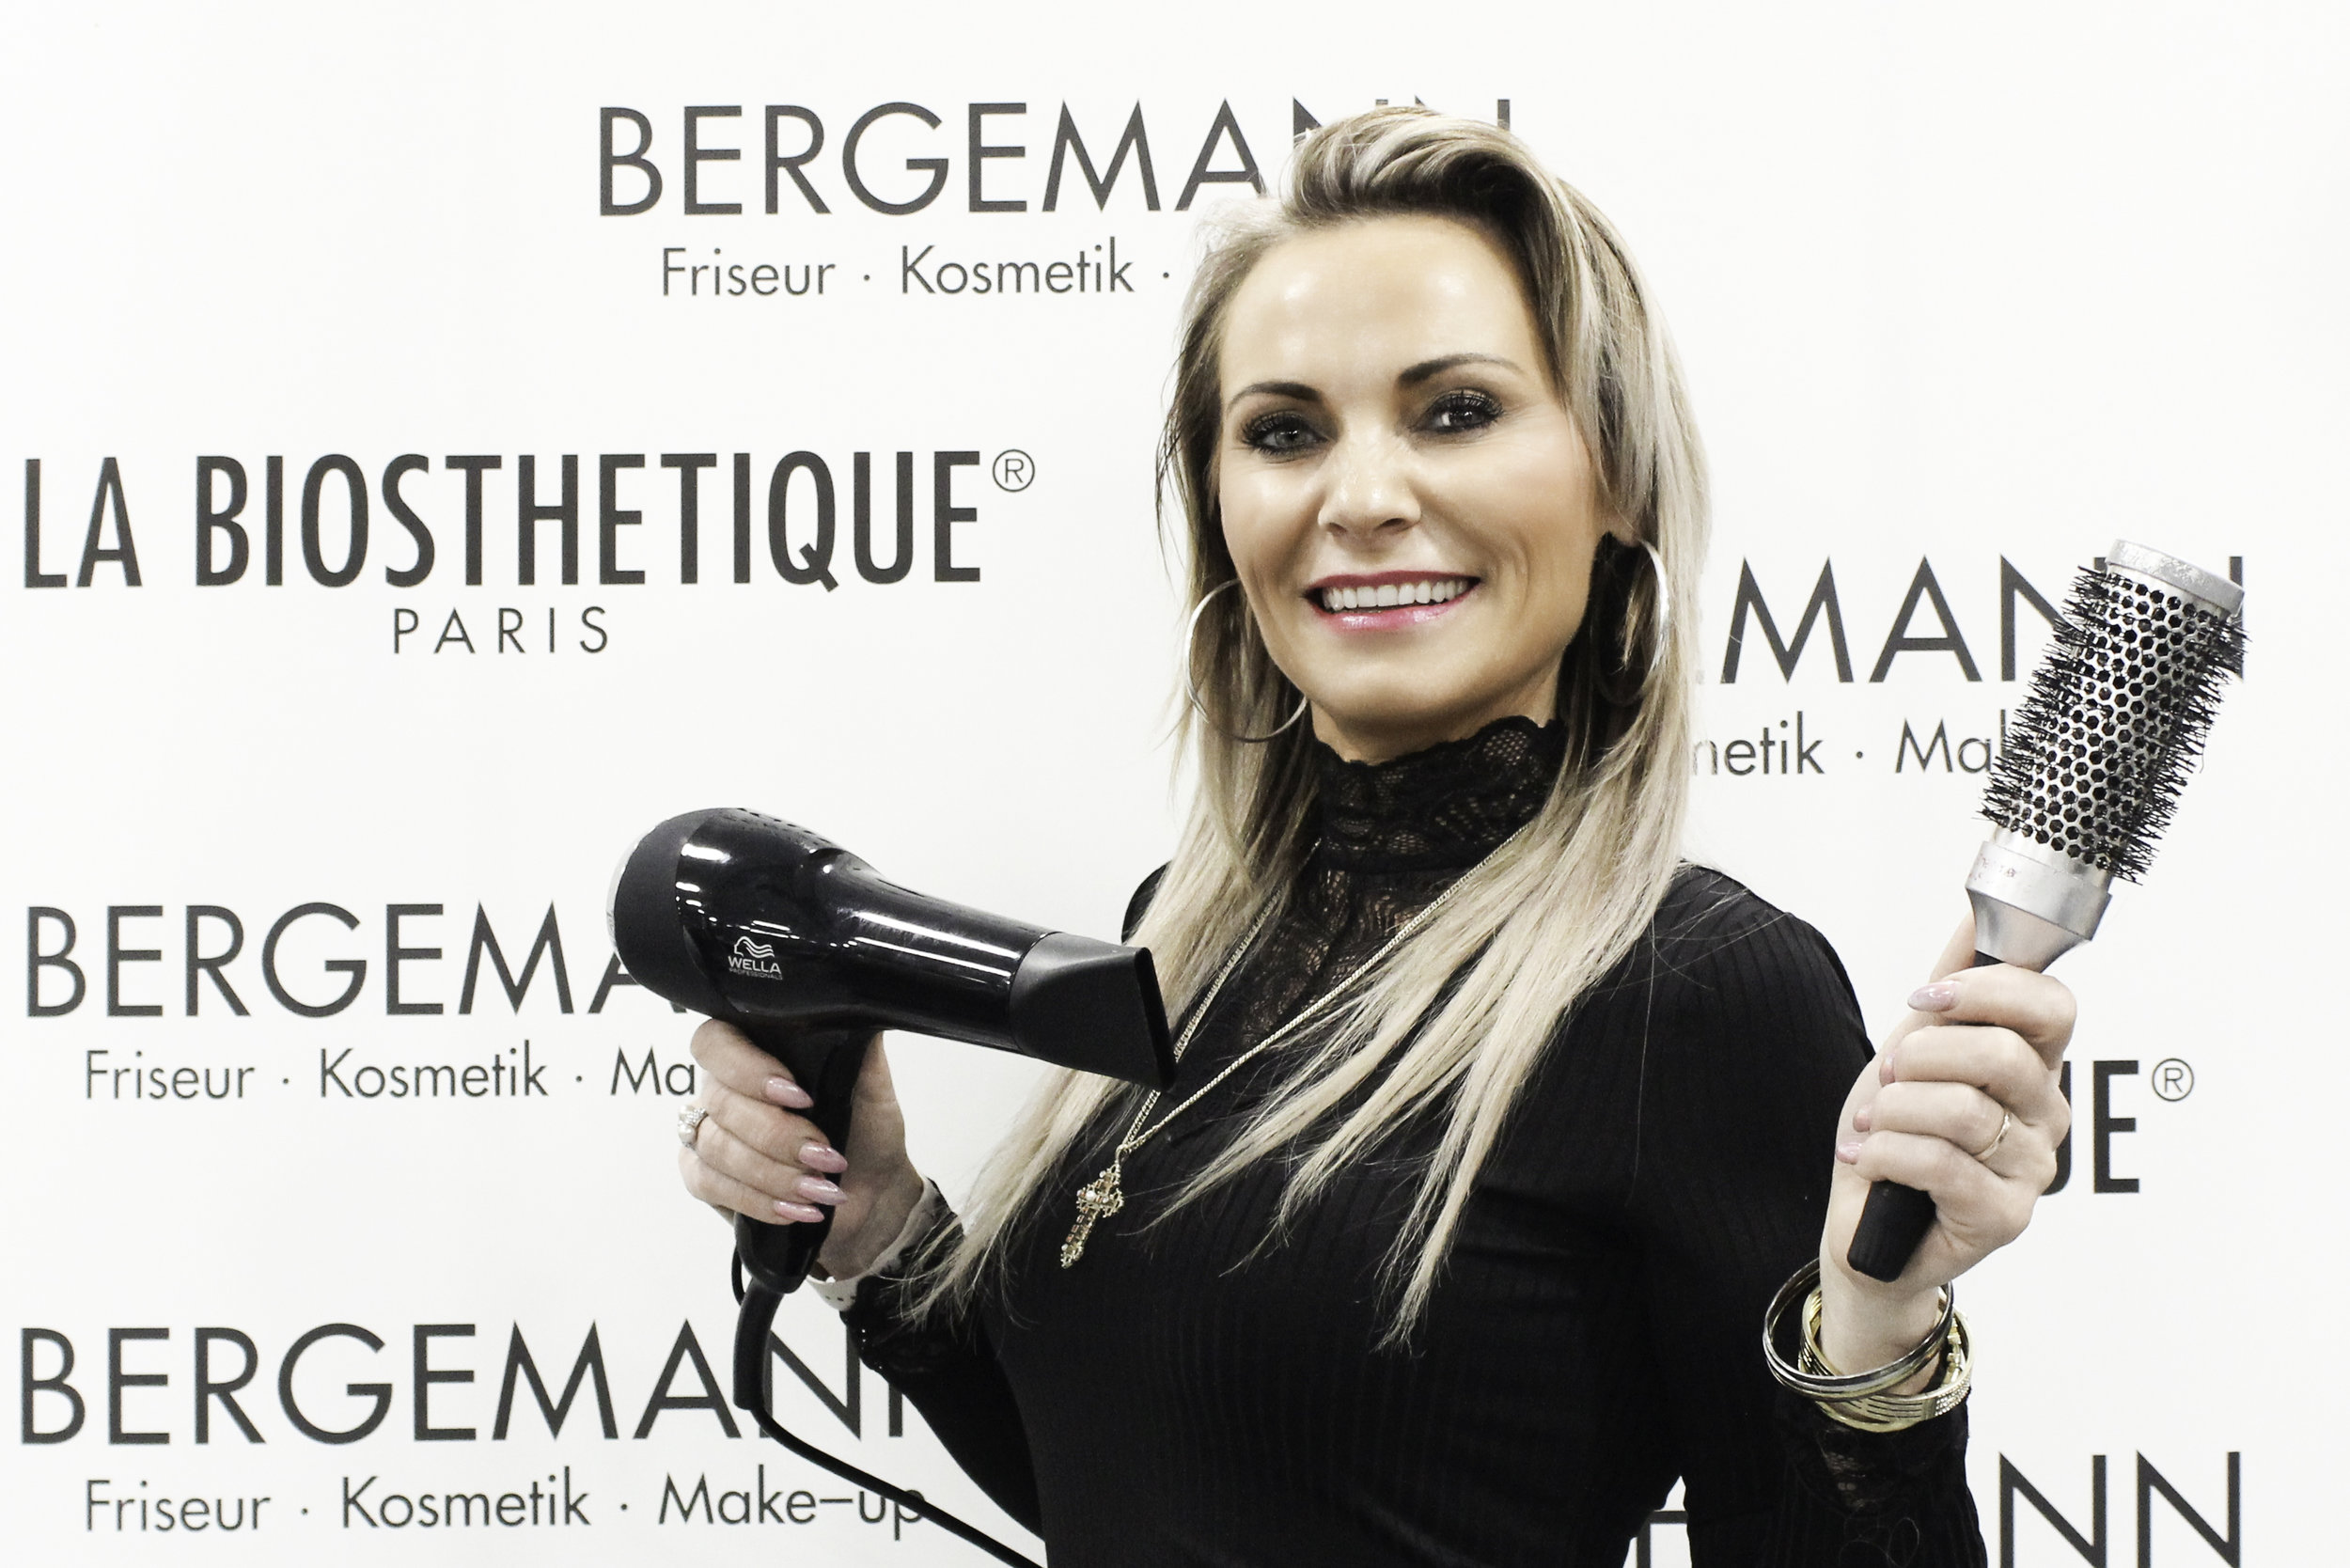 Olga - Friseurin